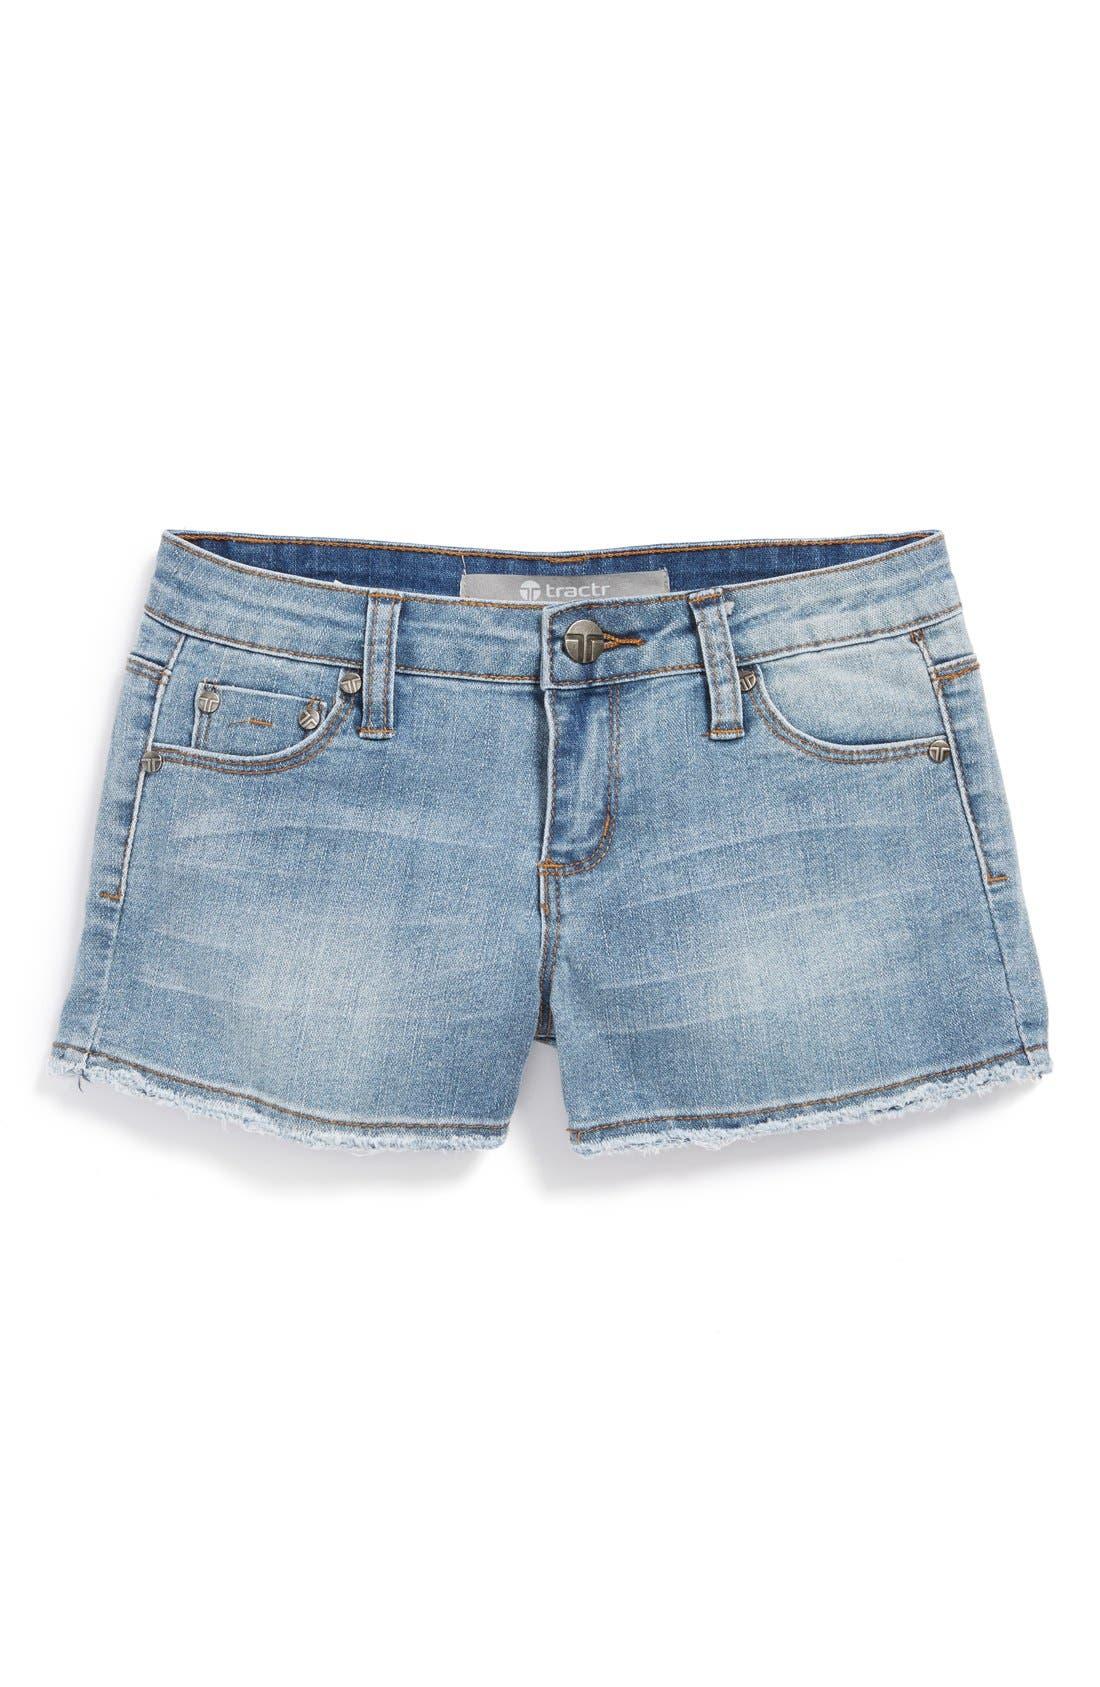 Alternate Image 2  - Tractr Frayed Denim Shorts (Big Girls)